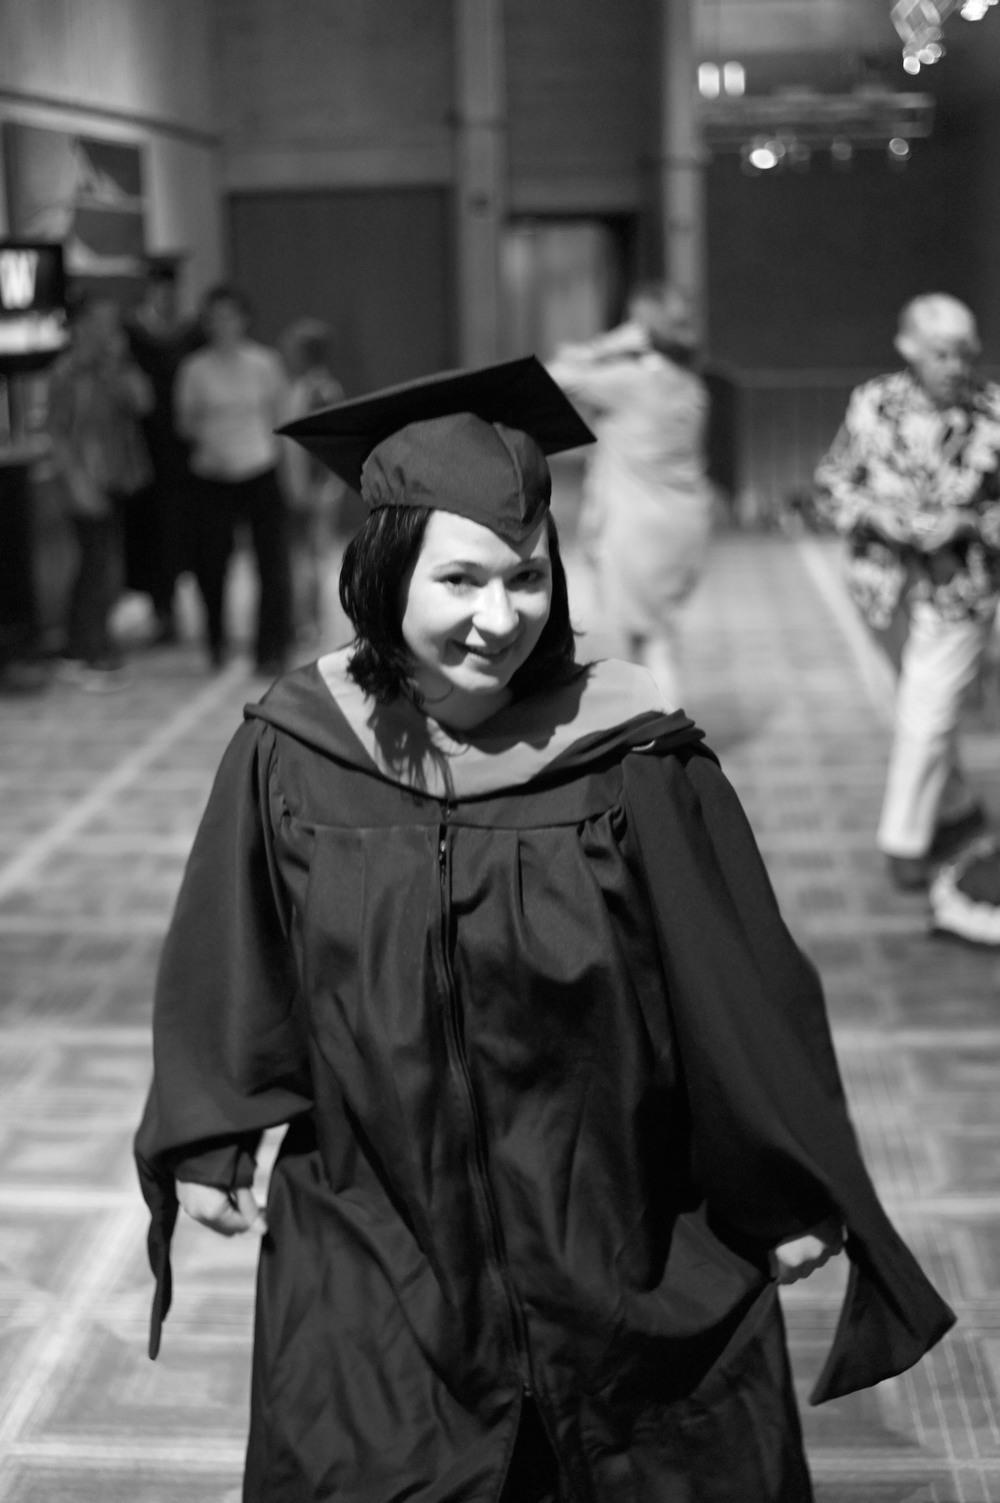 20140612_m9_EvansSchool_Graduation_019_BW.jpg